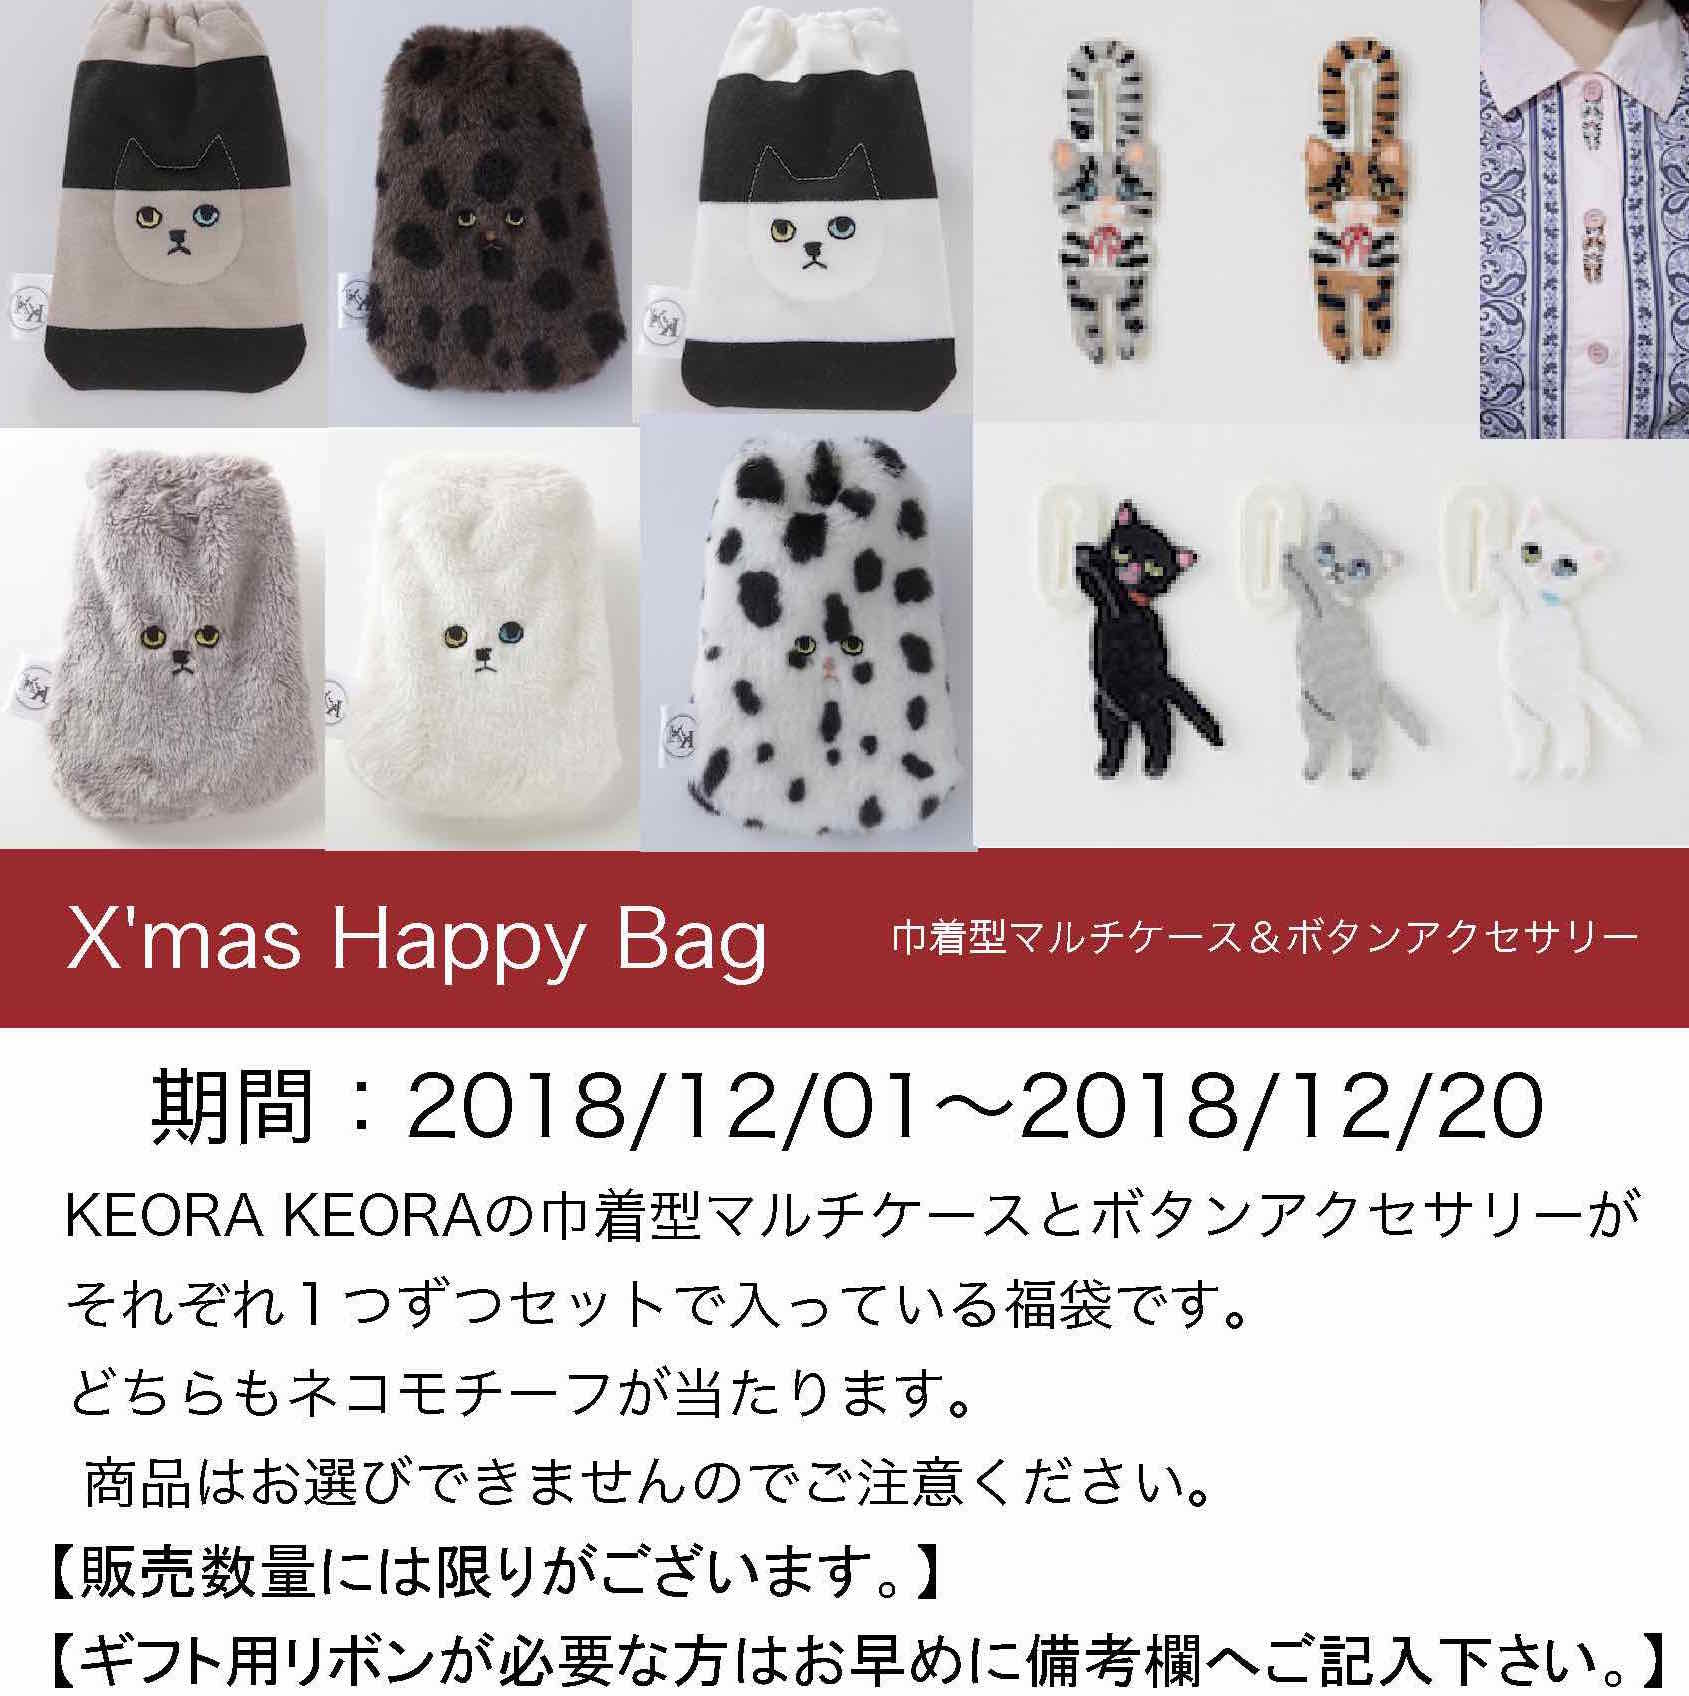 【X'mas Happy Bag】巾着型マルチケース&ボタンアクセサリー【ツリーにも◎】